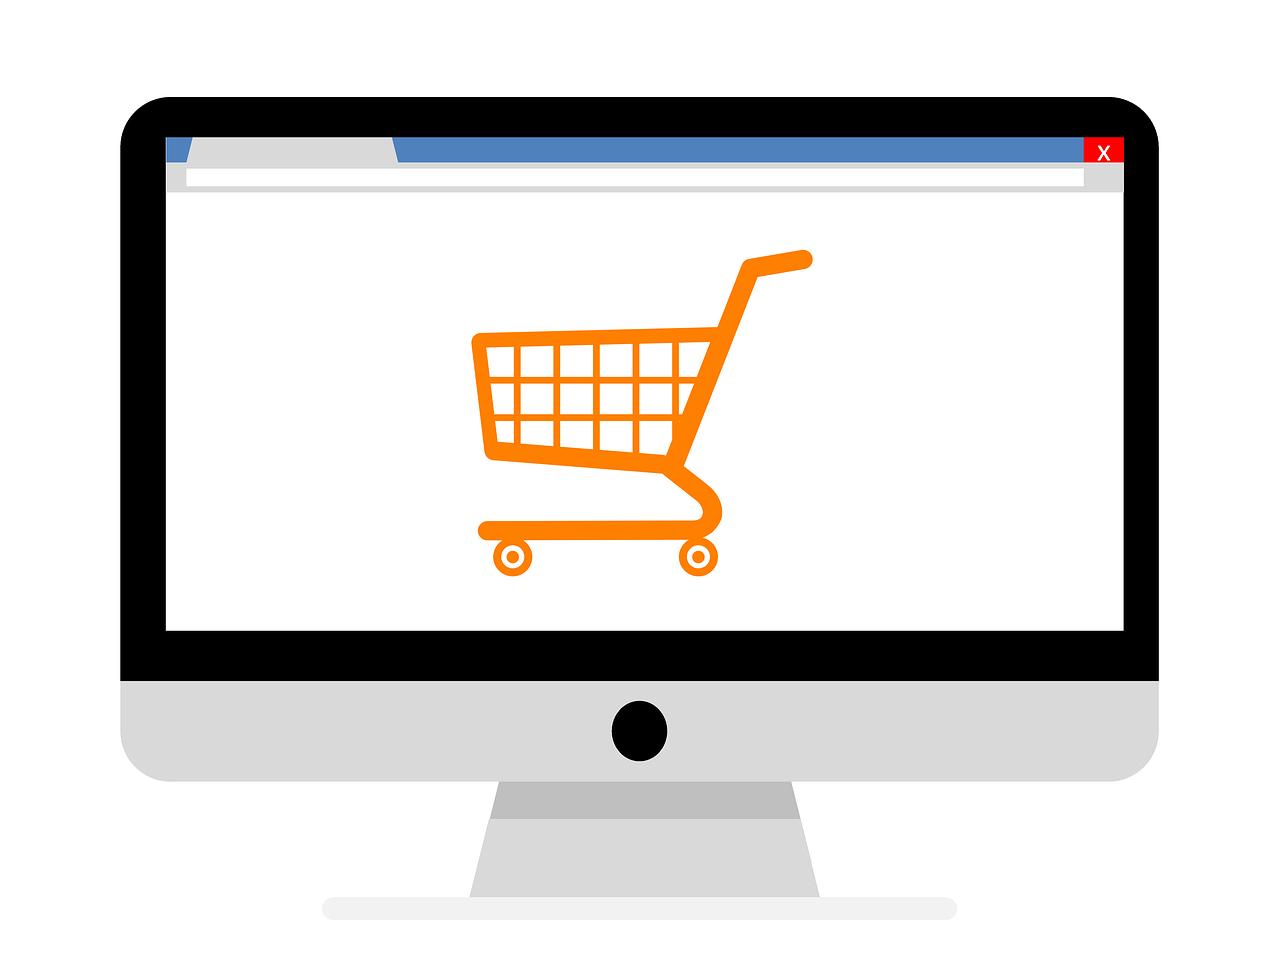 web shop 1539997873 - ワードプレスでネットショップを作るメリット・デメリット